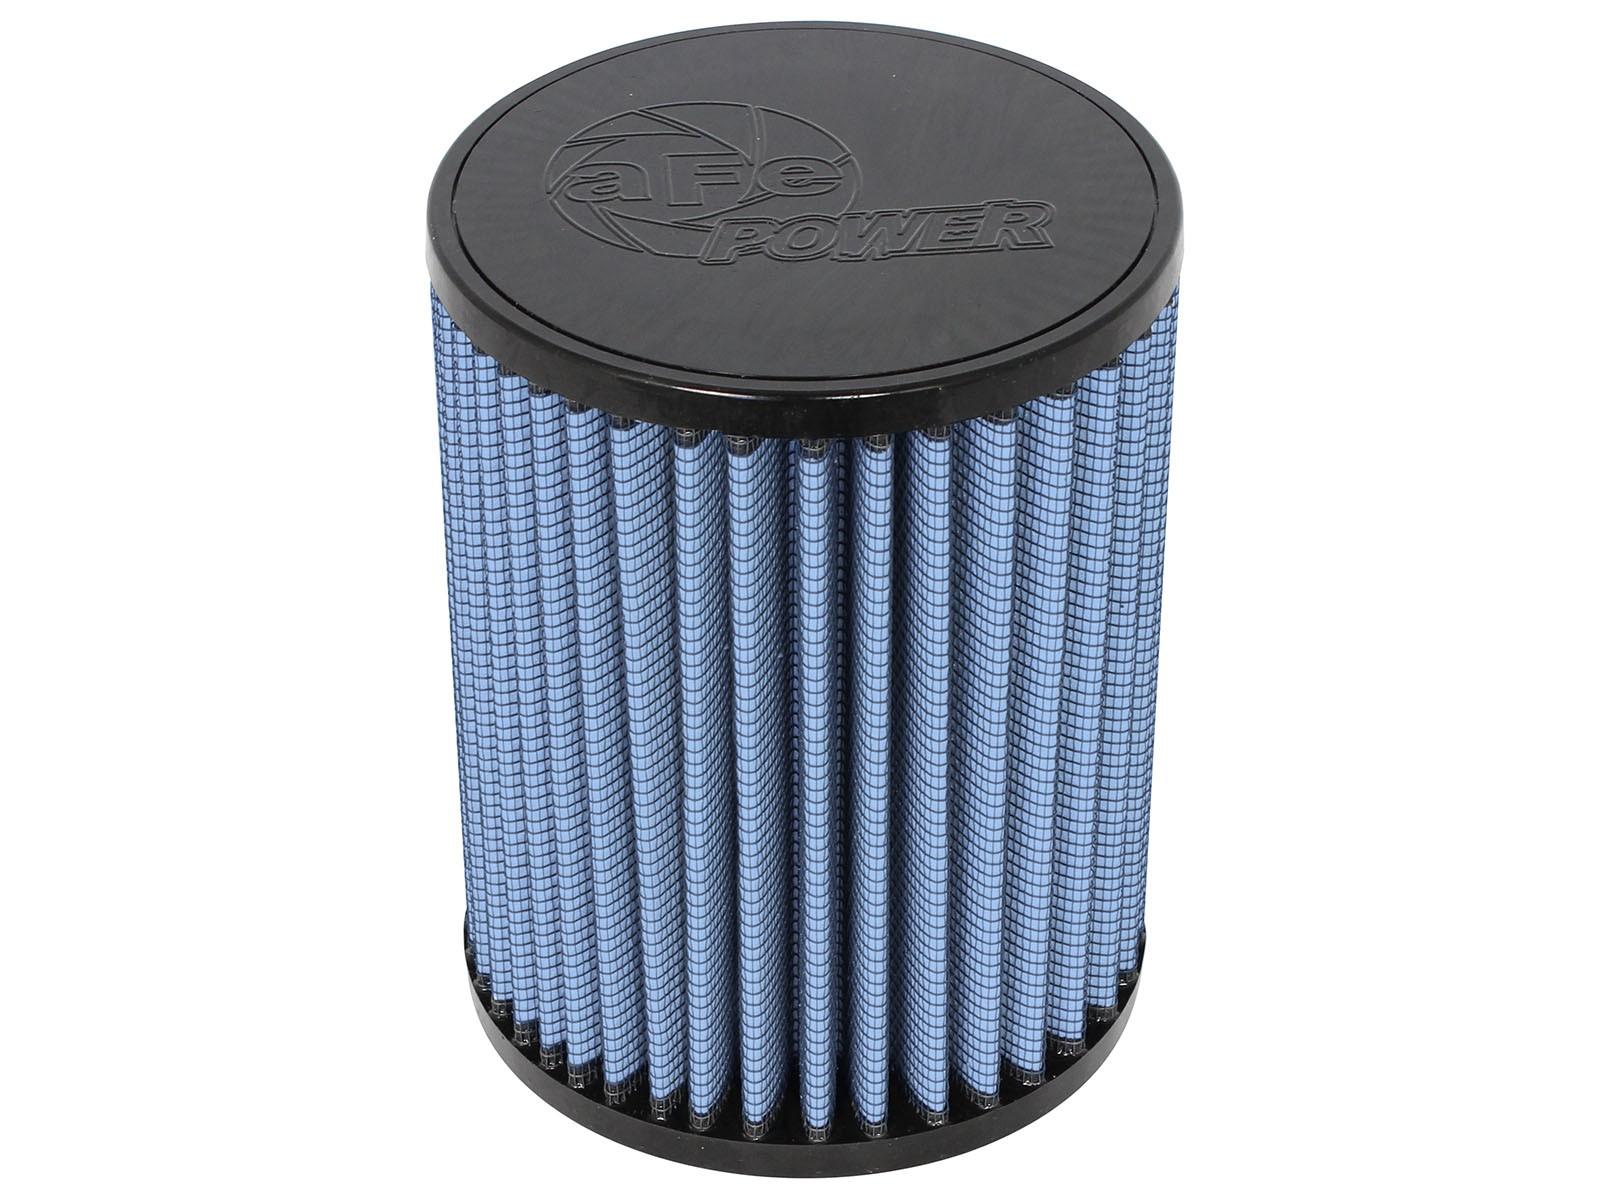 aFe POWER 10-10060 Magnum FLOW Pro 5R Air Filter